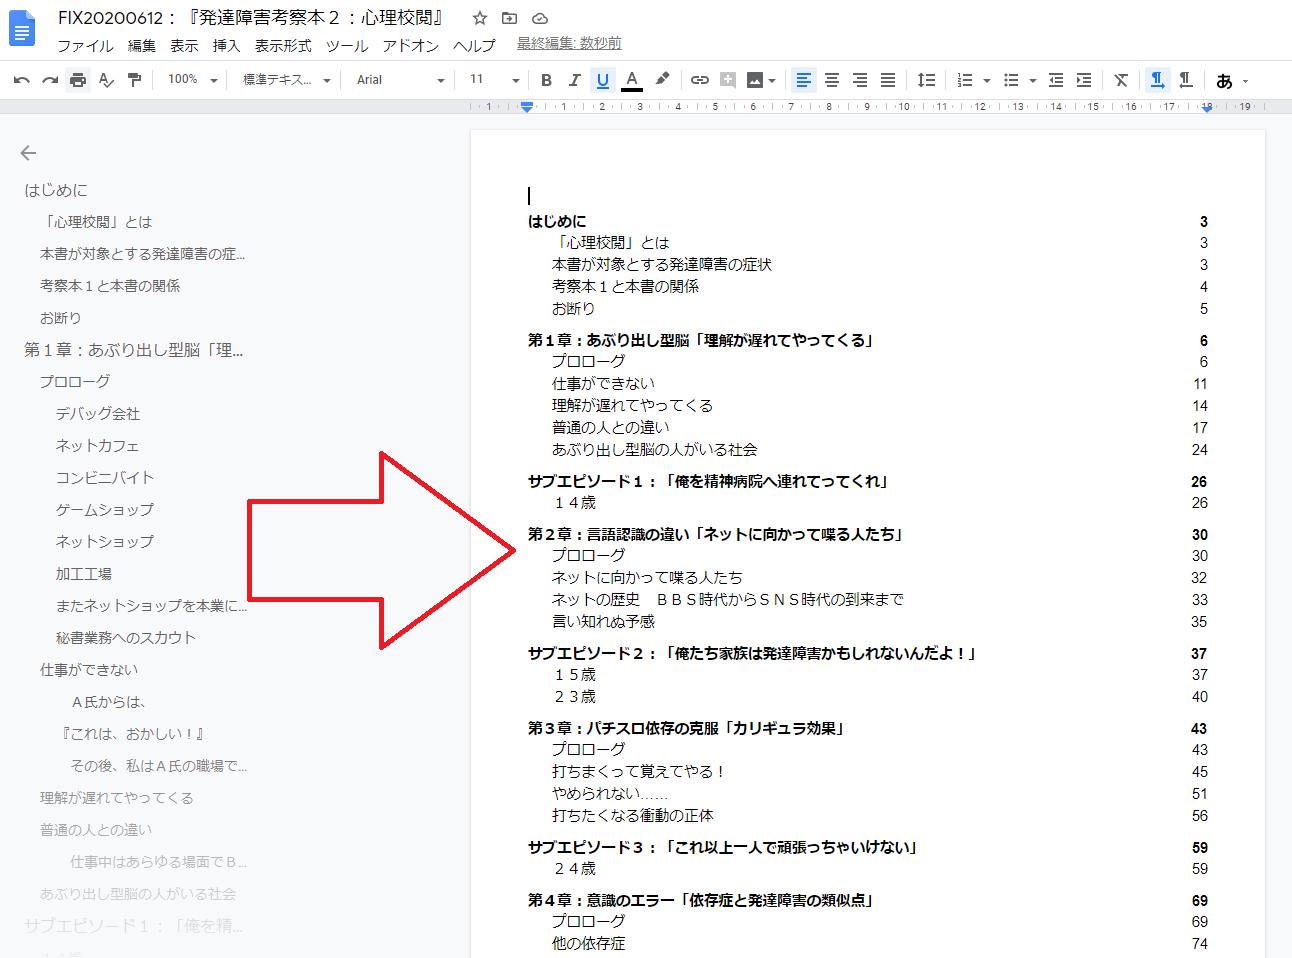 f:id:hyogokurumi:20200629132507p:plain